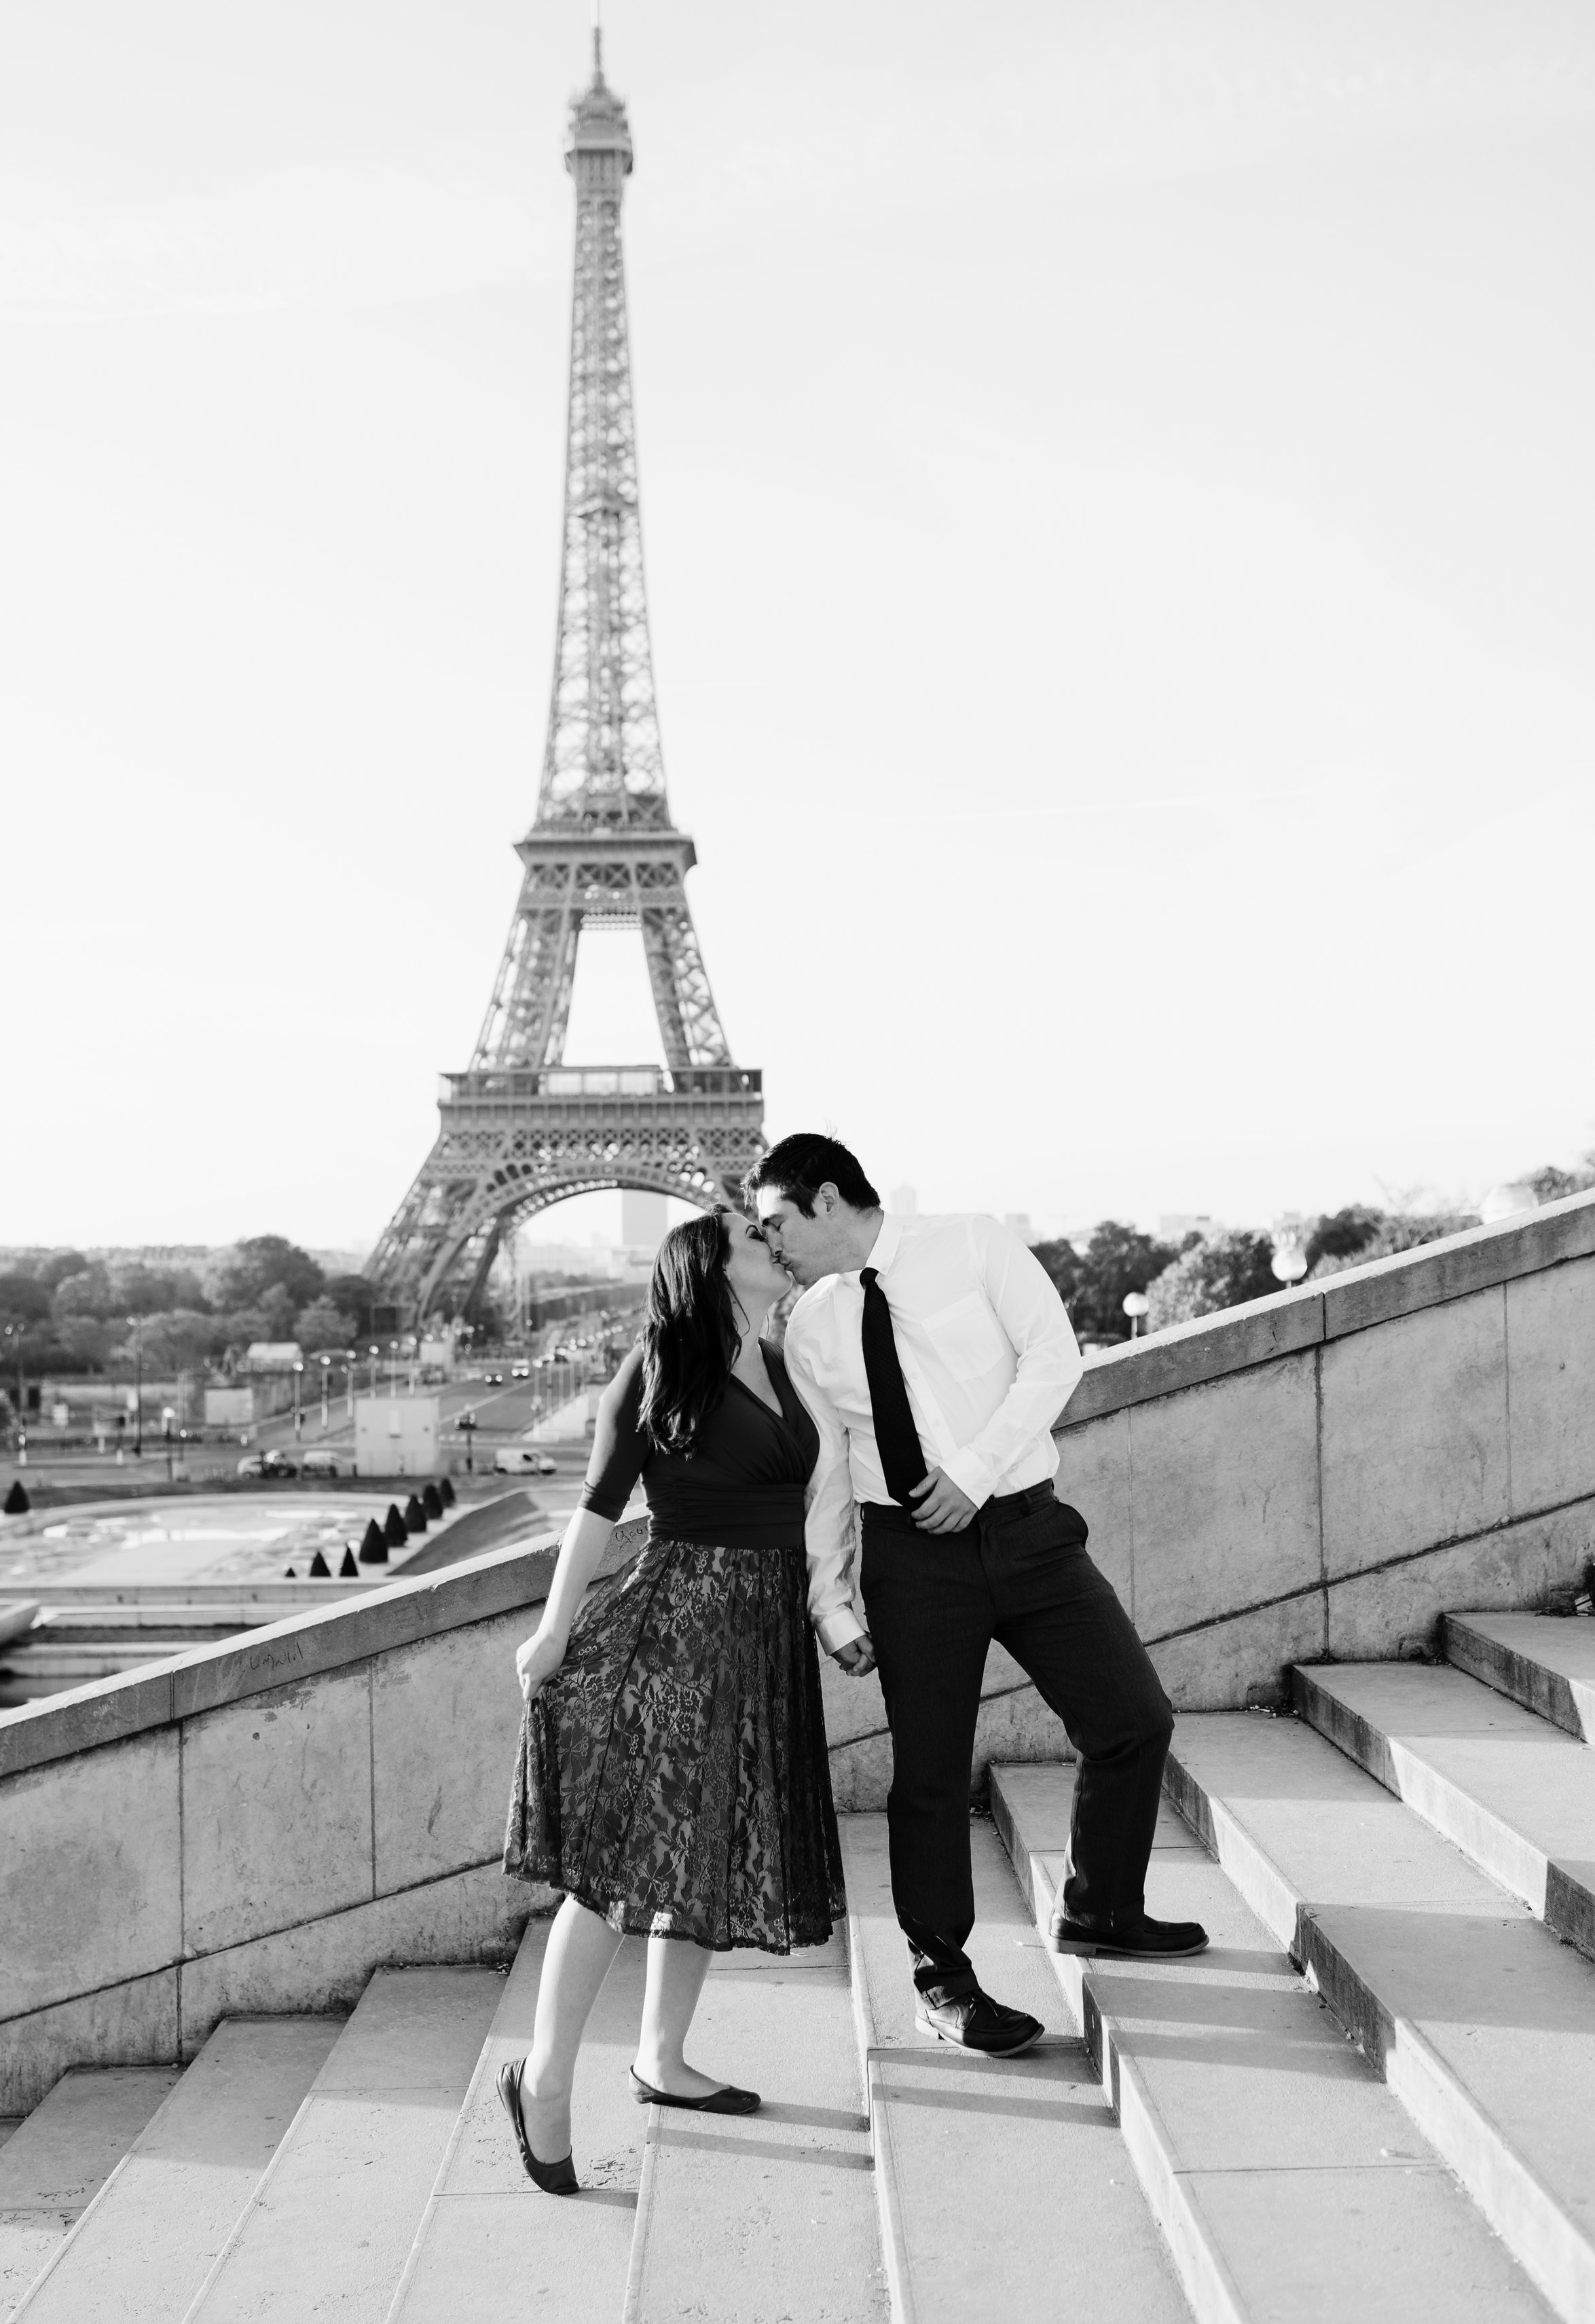 Couple-photoshoot-Anniversary-Paris-Eiffel-Tower-Trocadero039.jpg